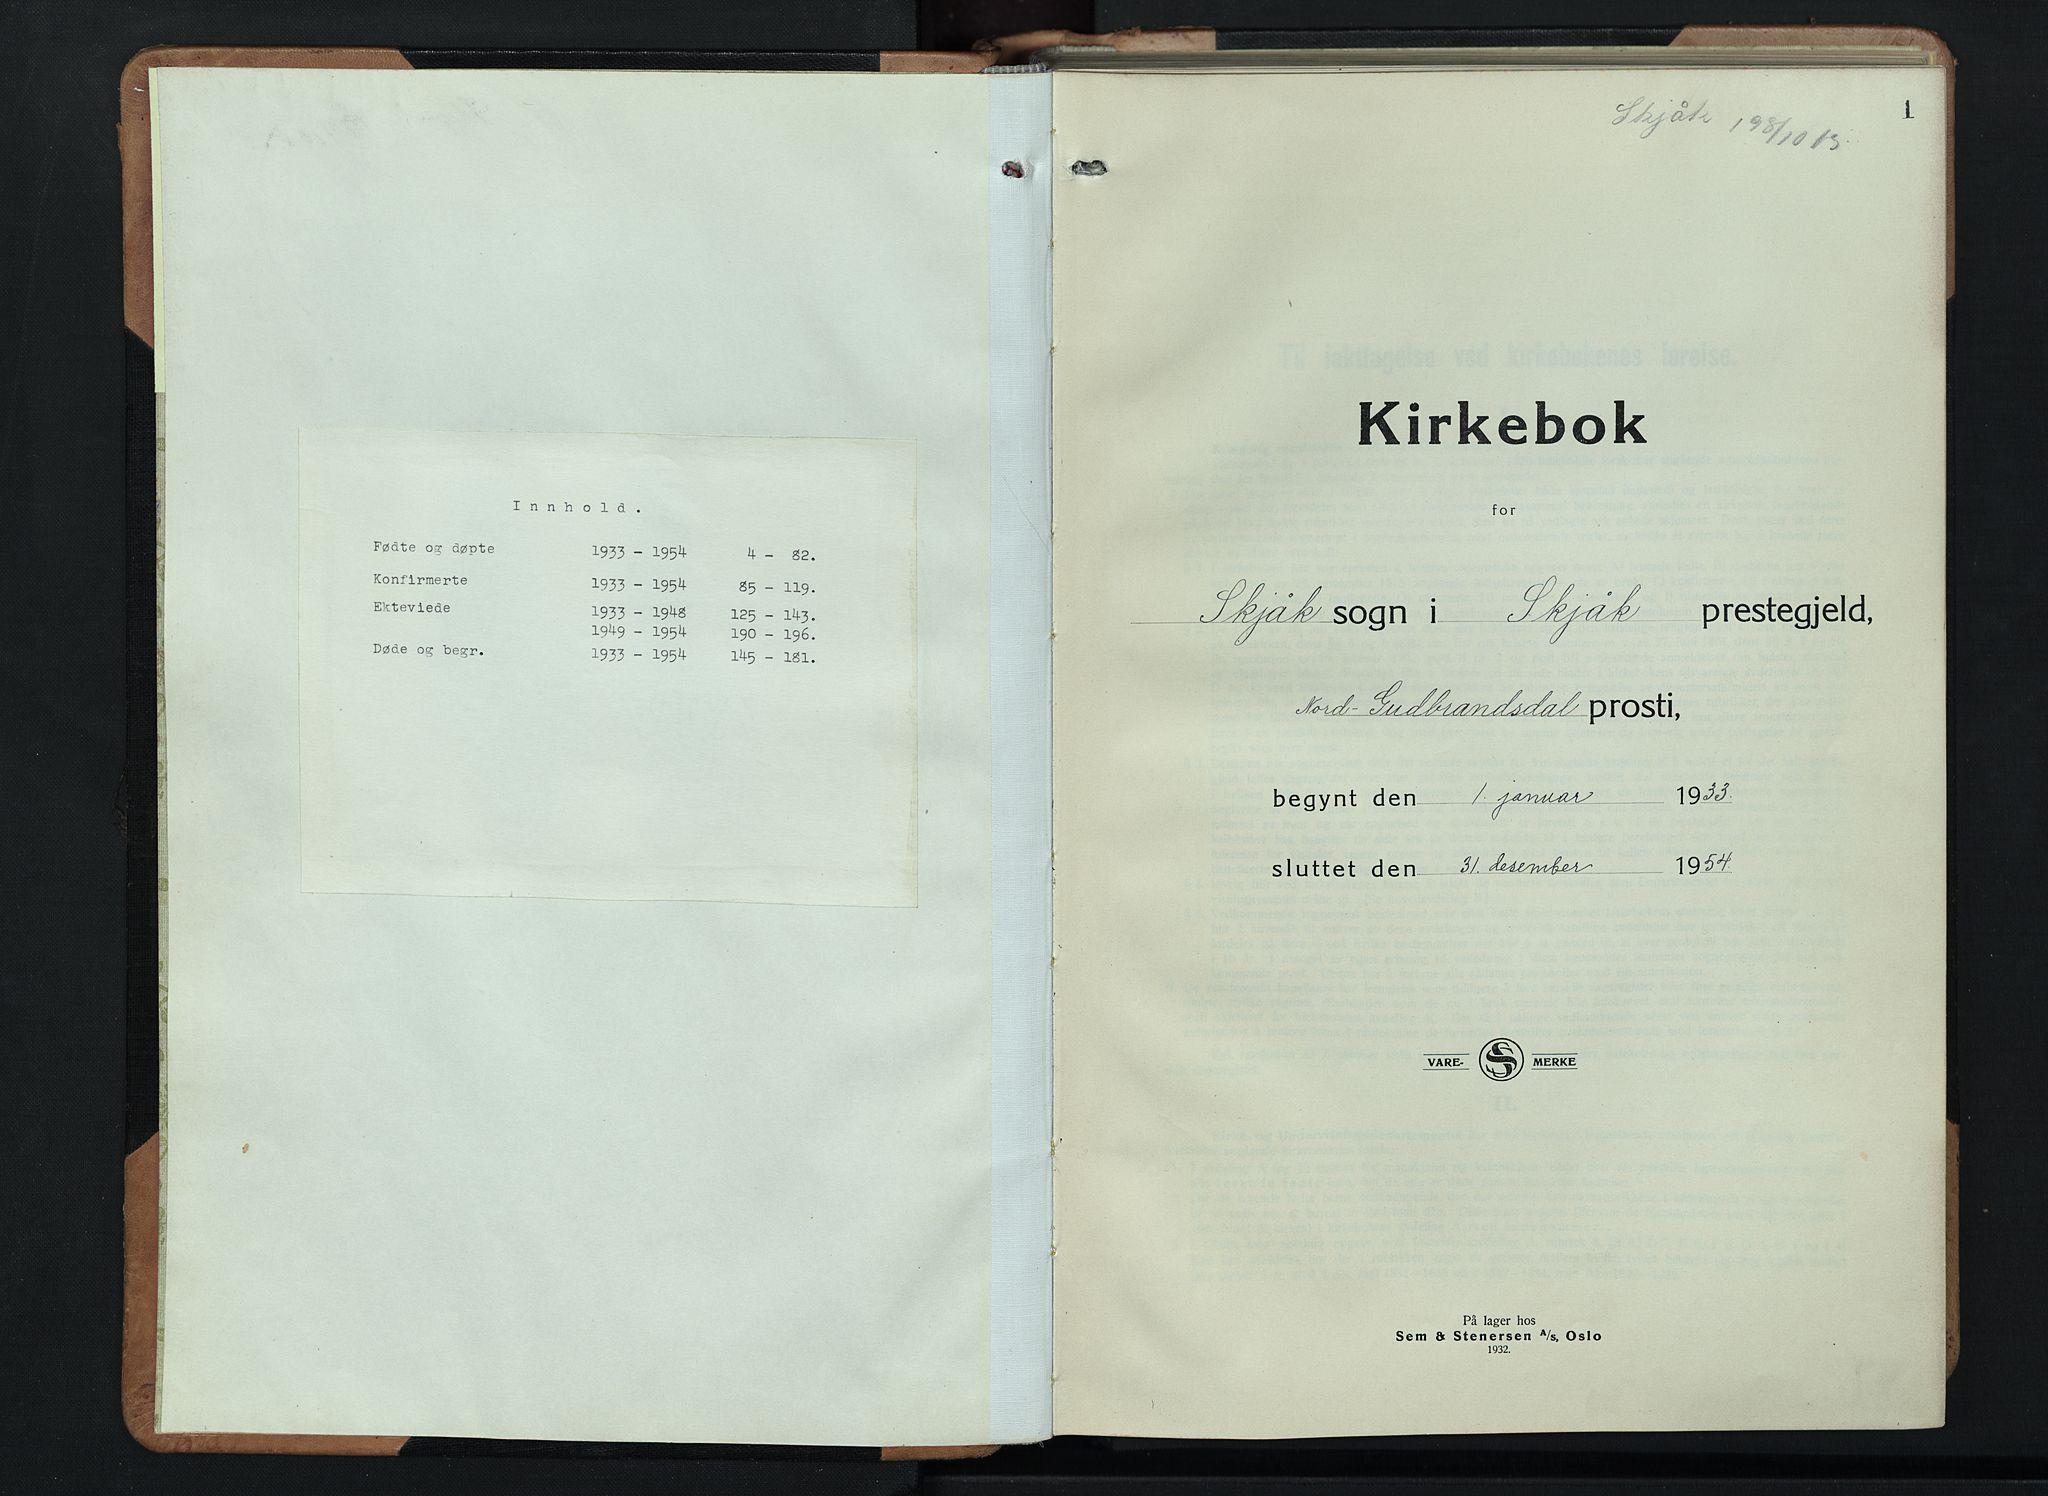 SAH, Skjåk prestekontor, Klokkerbok nr. 6, 1933-1954, s. 1